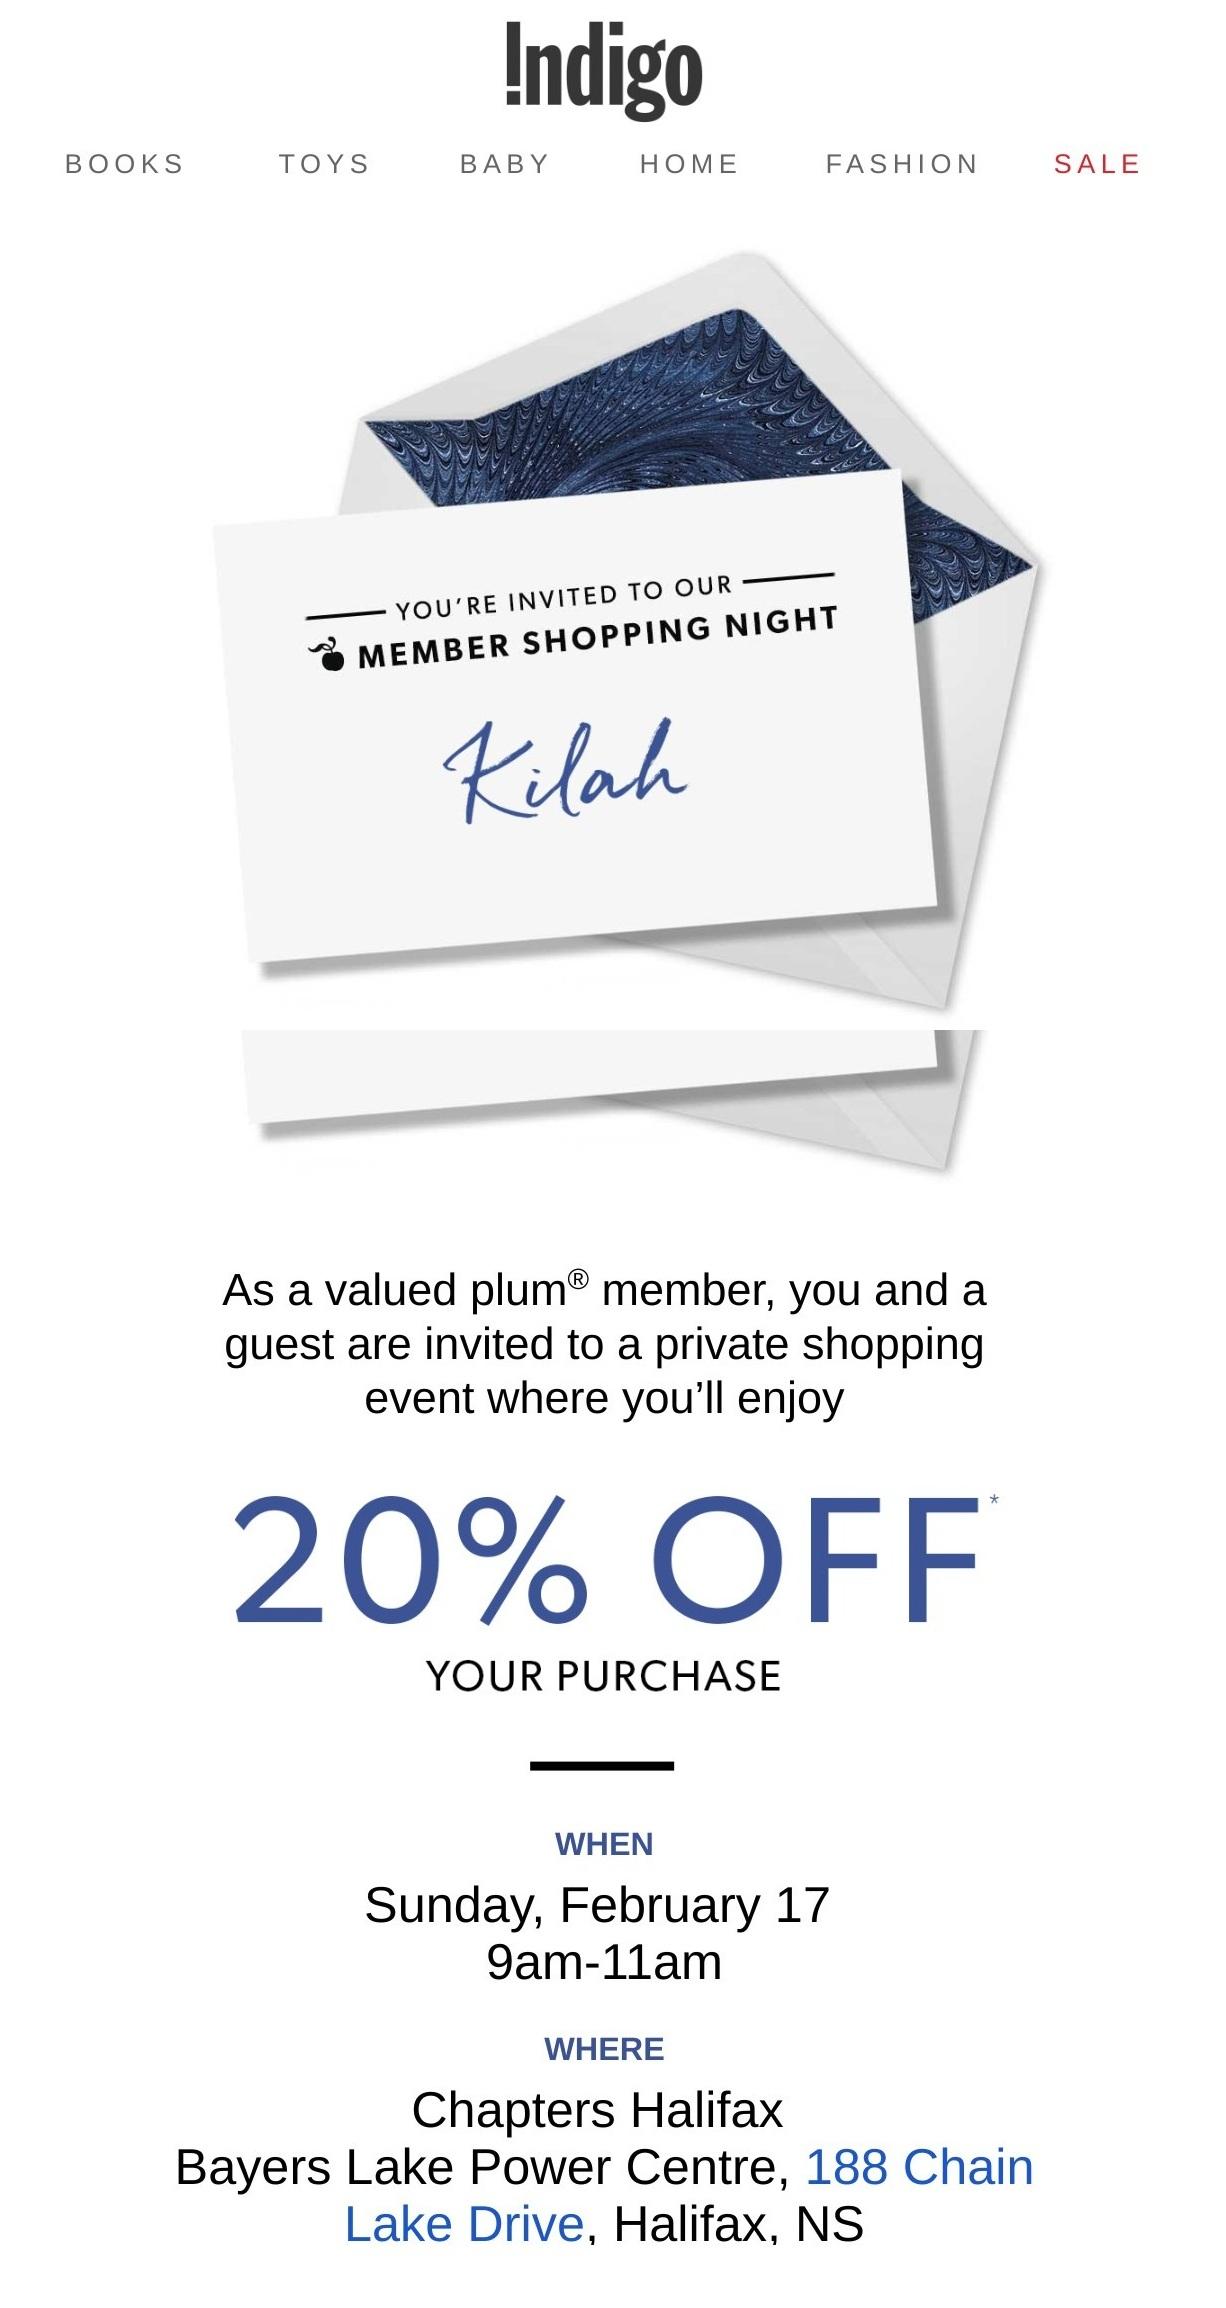 Indigo Exclusive Member Shopping Night.jpg